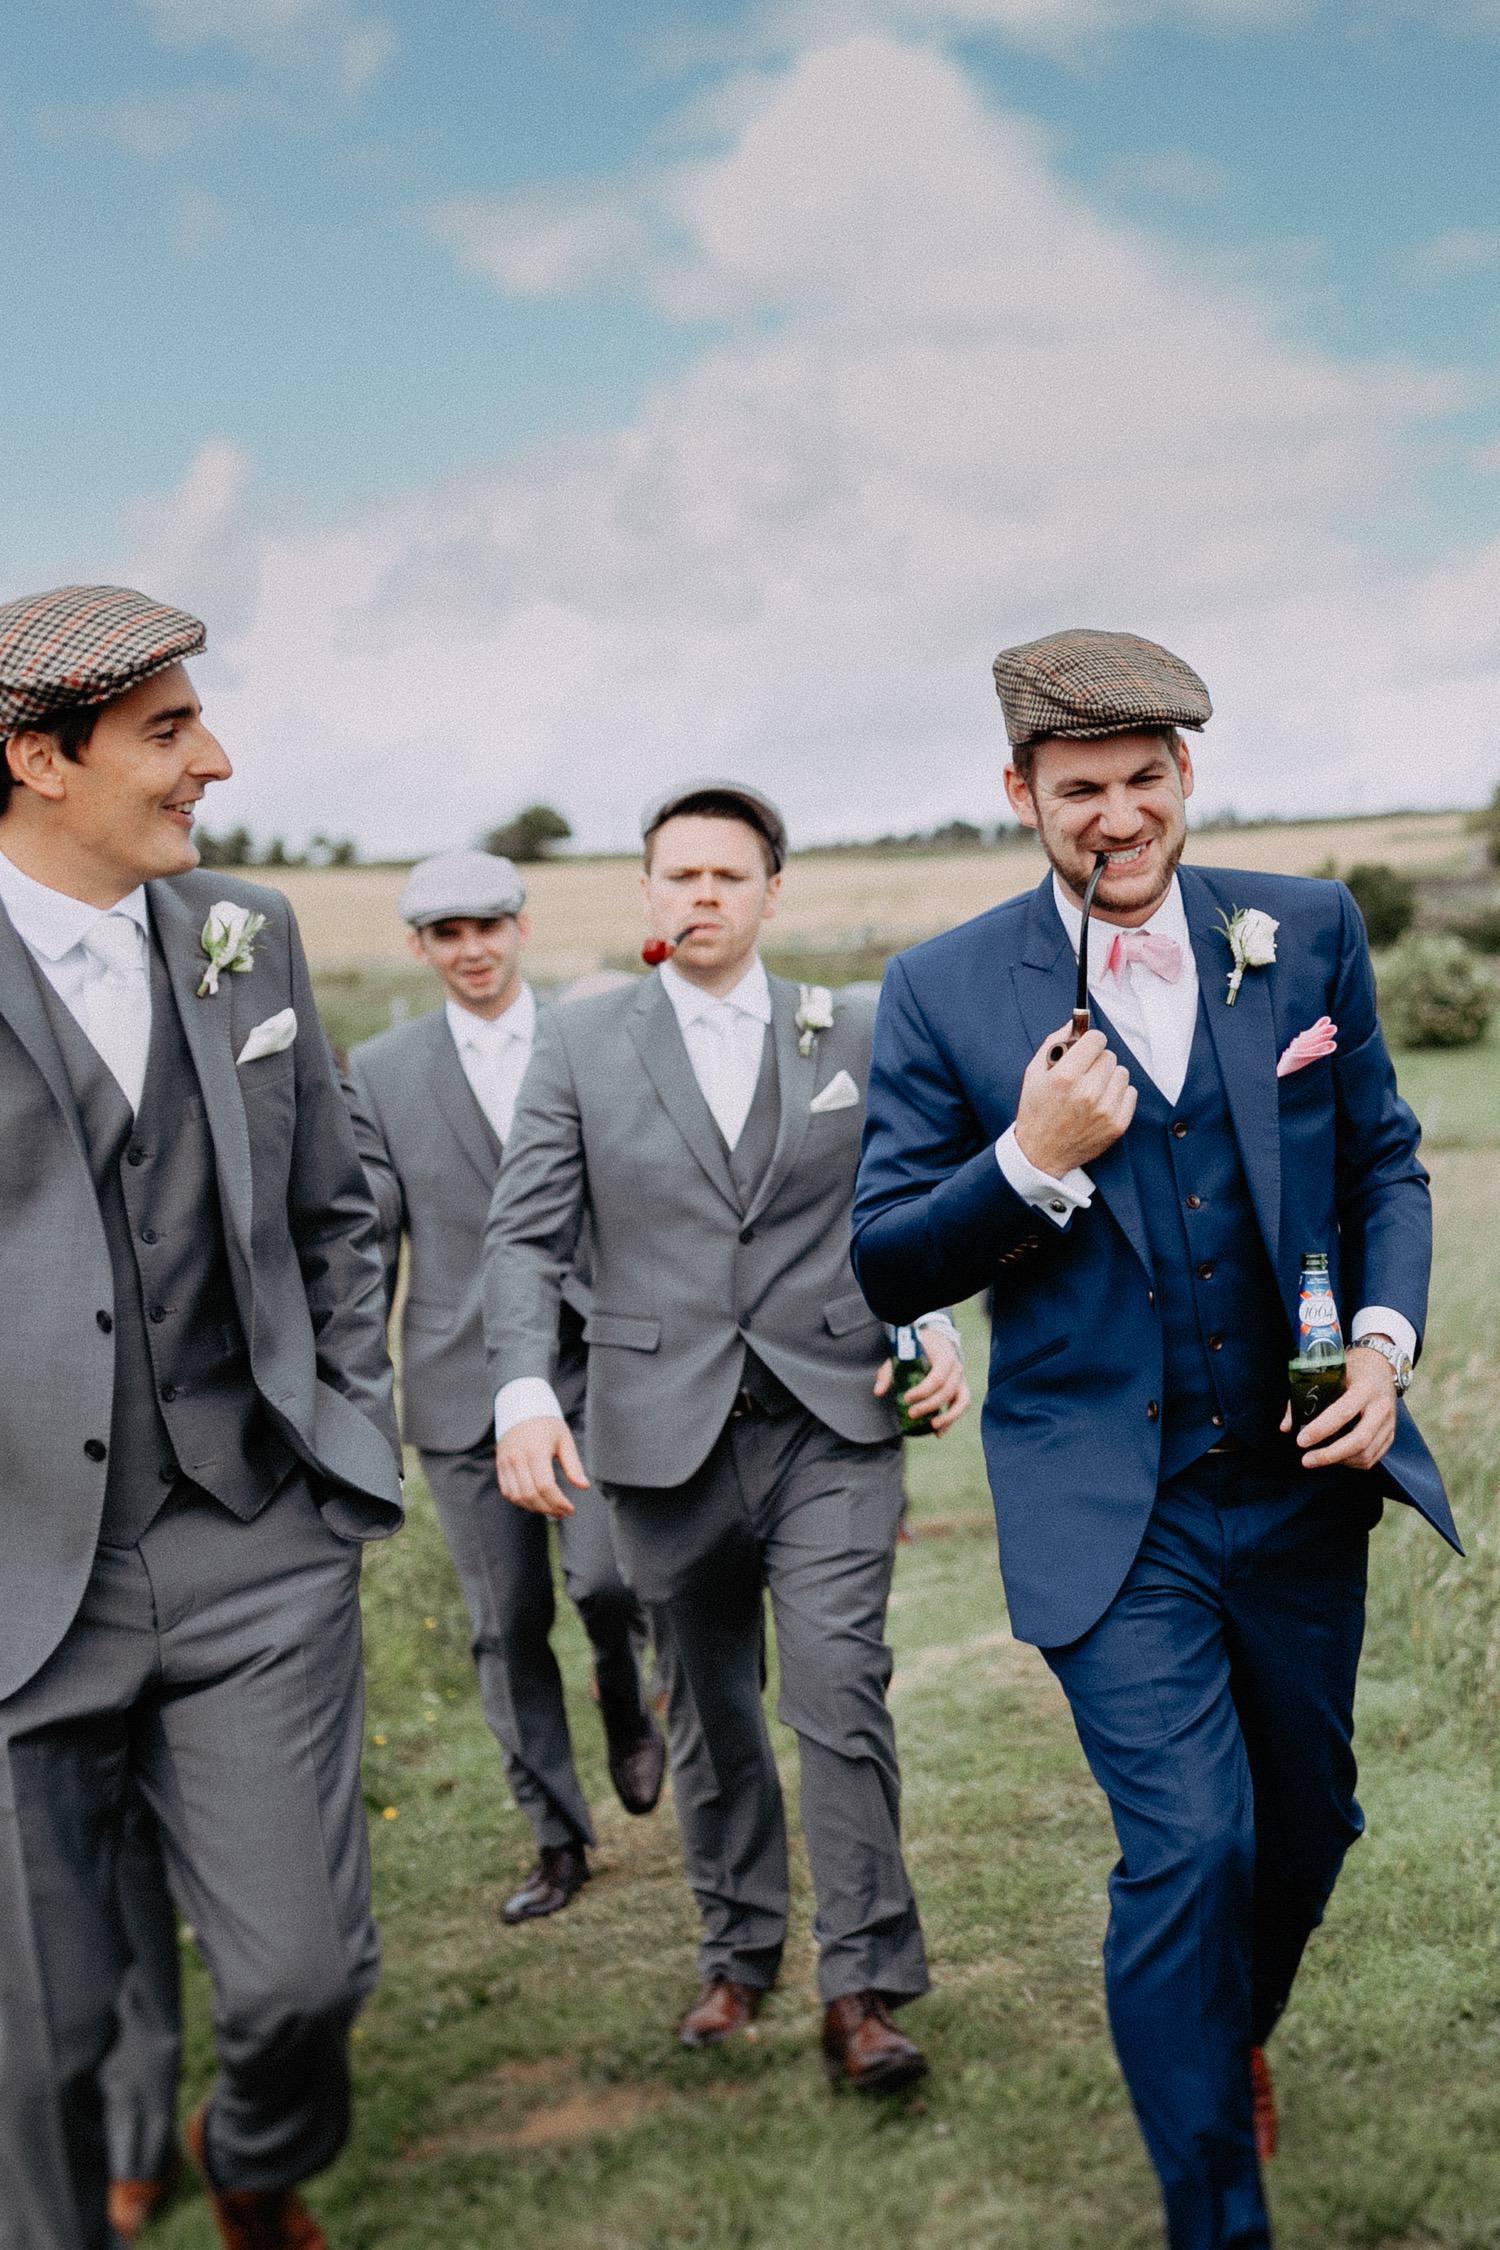 Natural-Retreats-Yorkshire-Wedding-Photographer-17.jpg